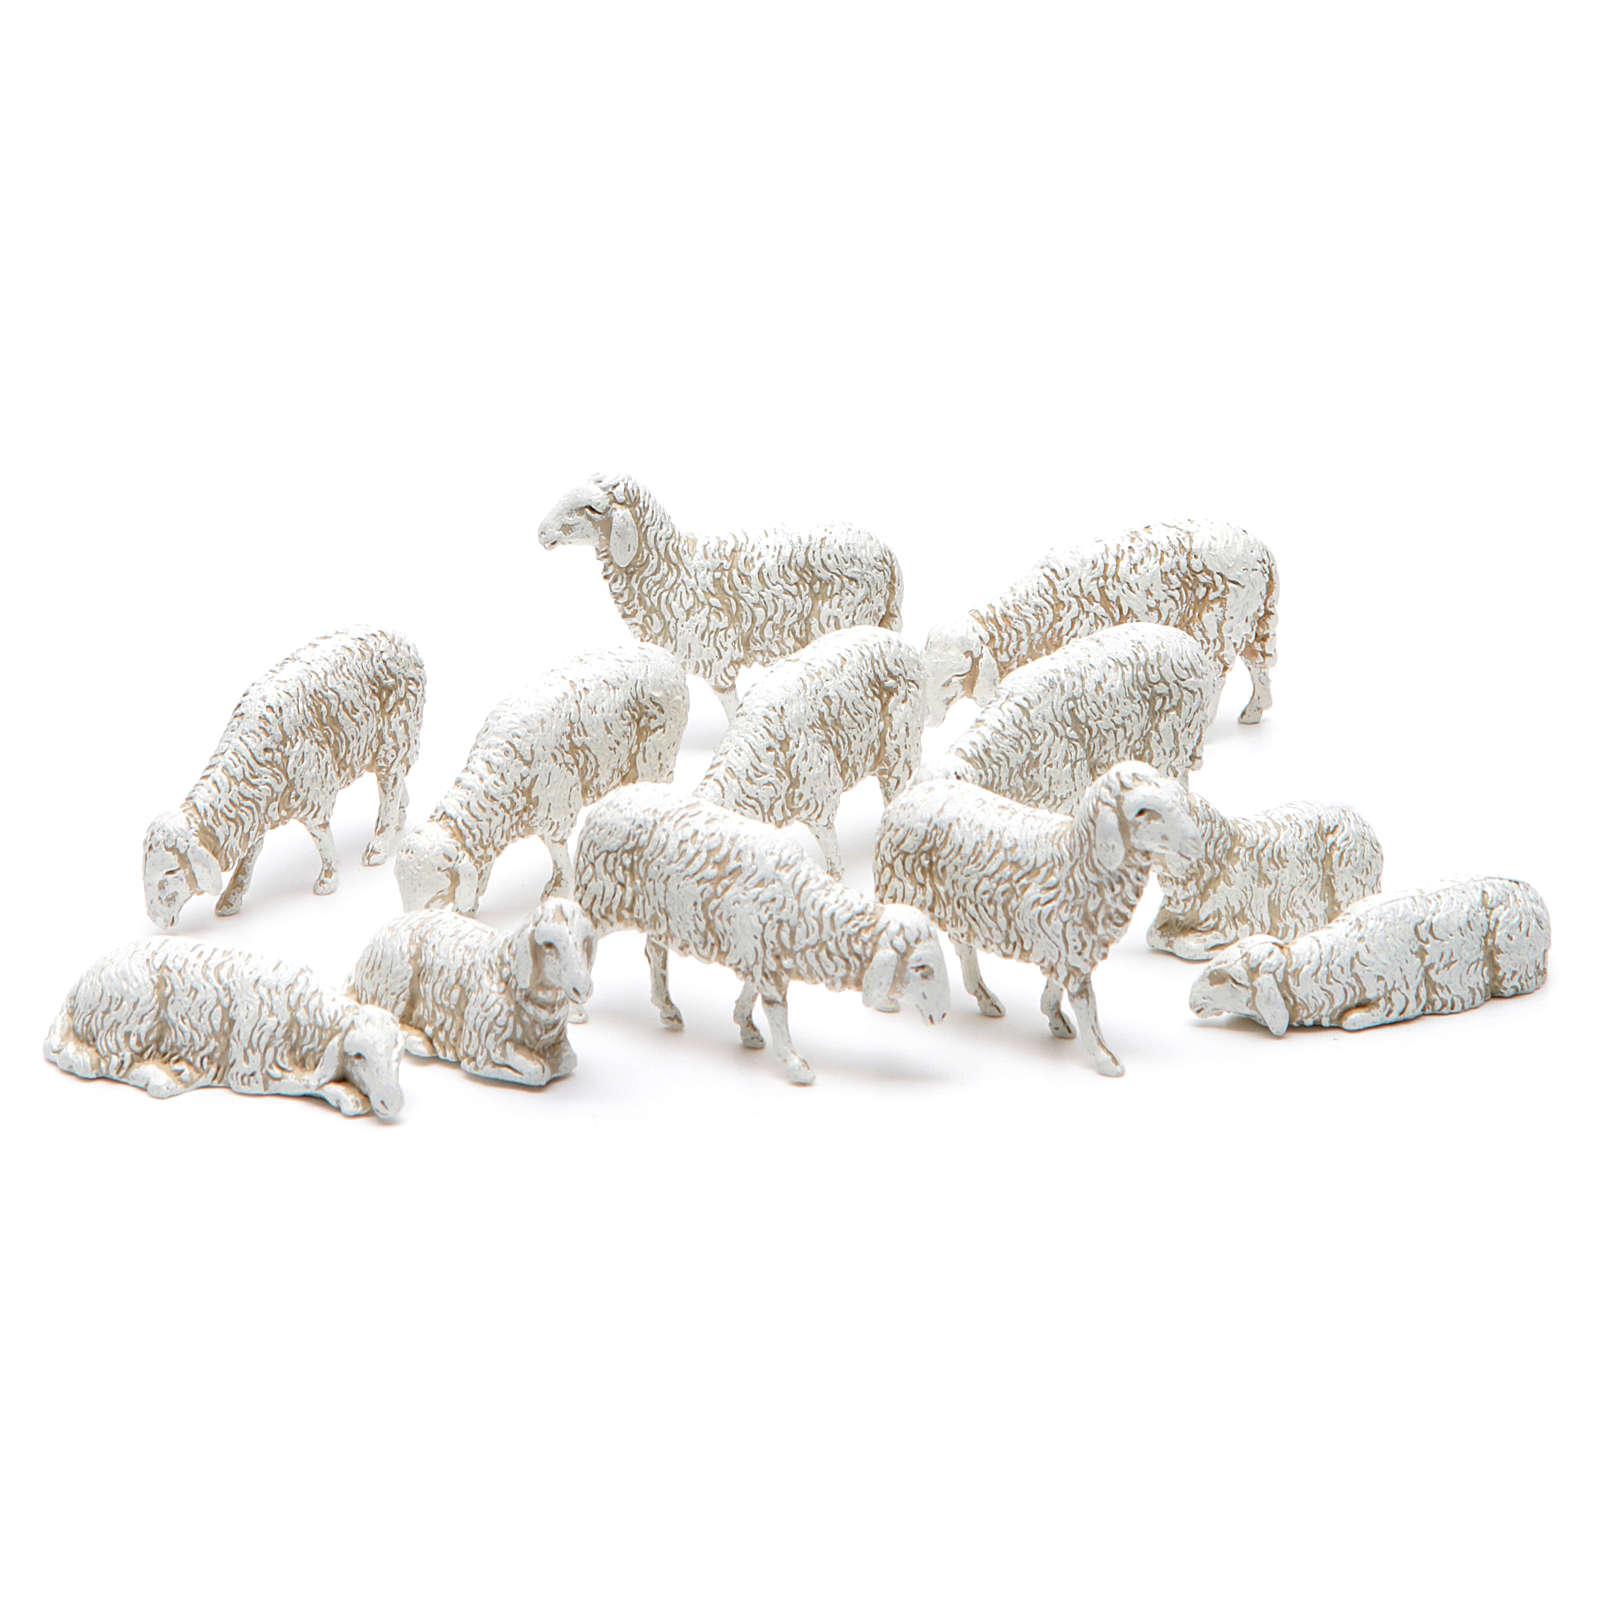 Owce mieszane do szopki 10cm Moranduzzo 12sztuk 4